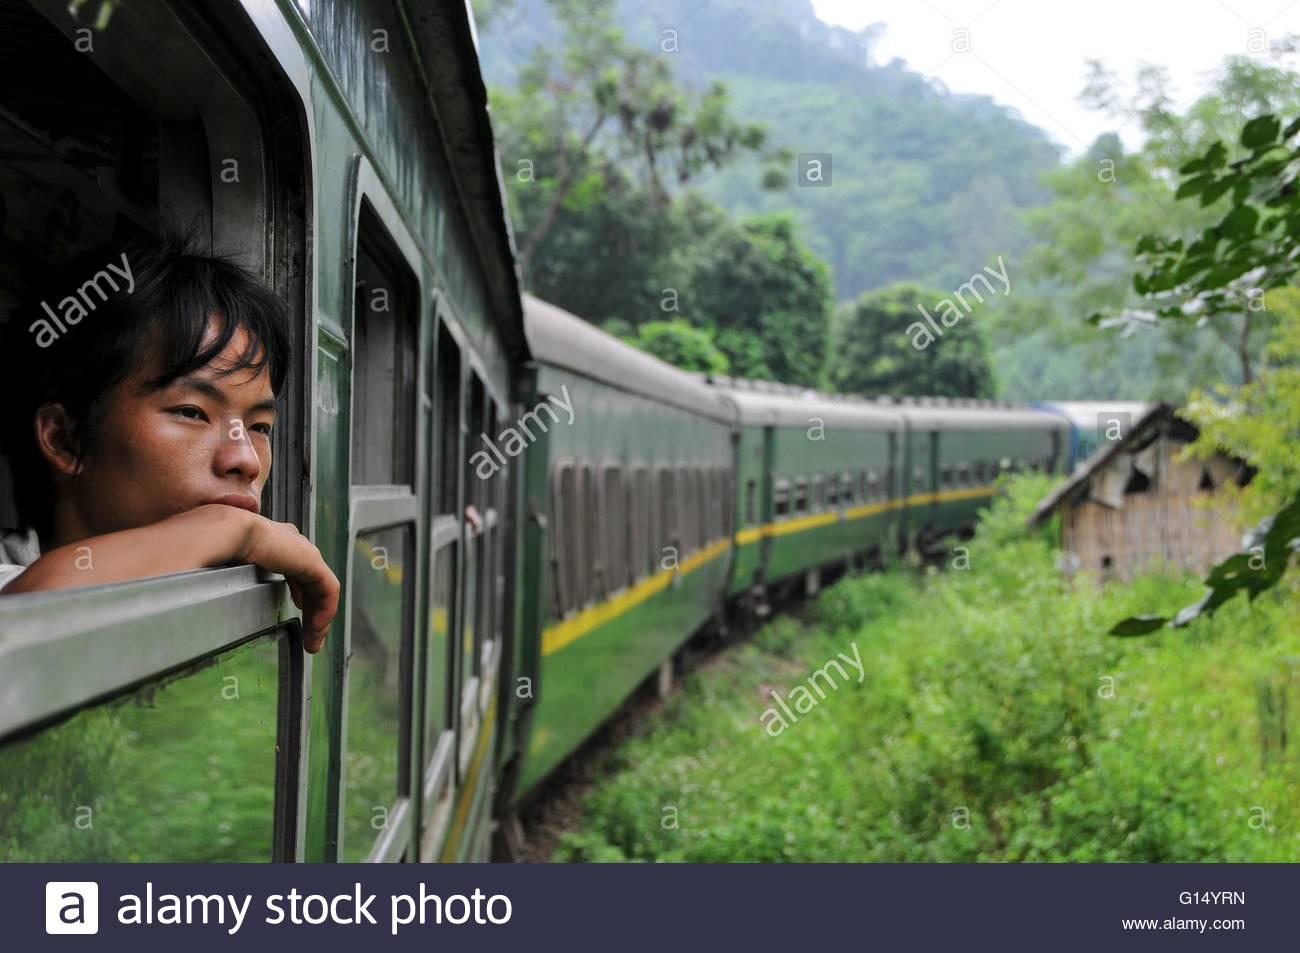 North Vietnam, train - Stock Image